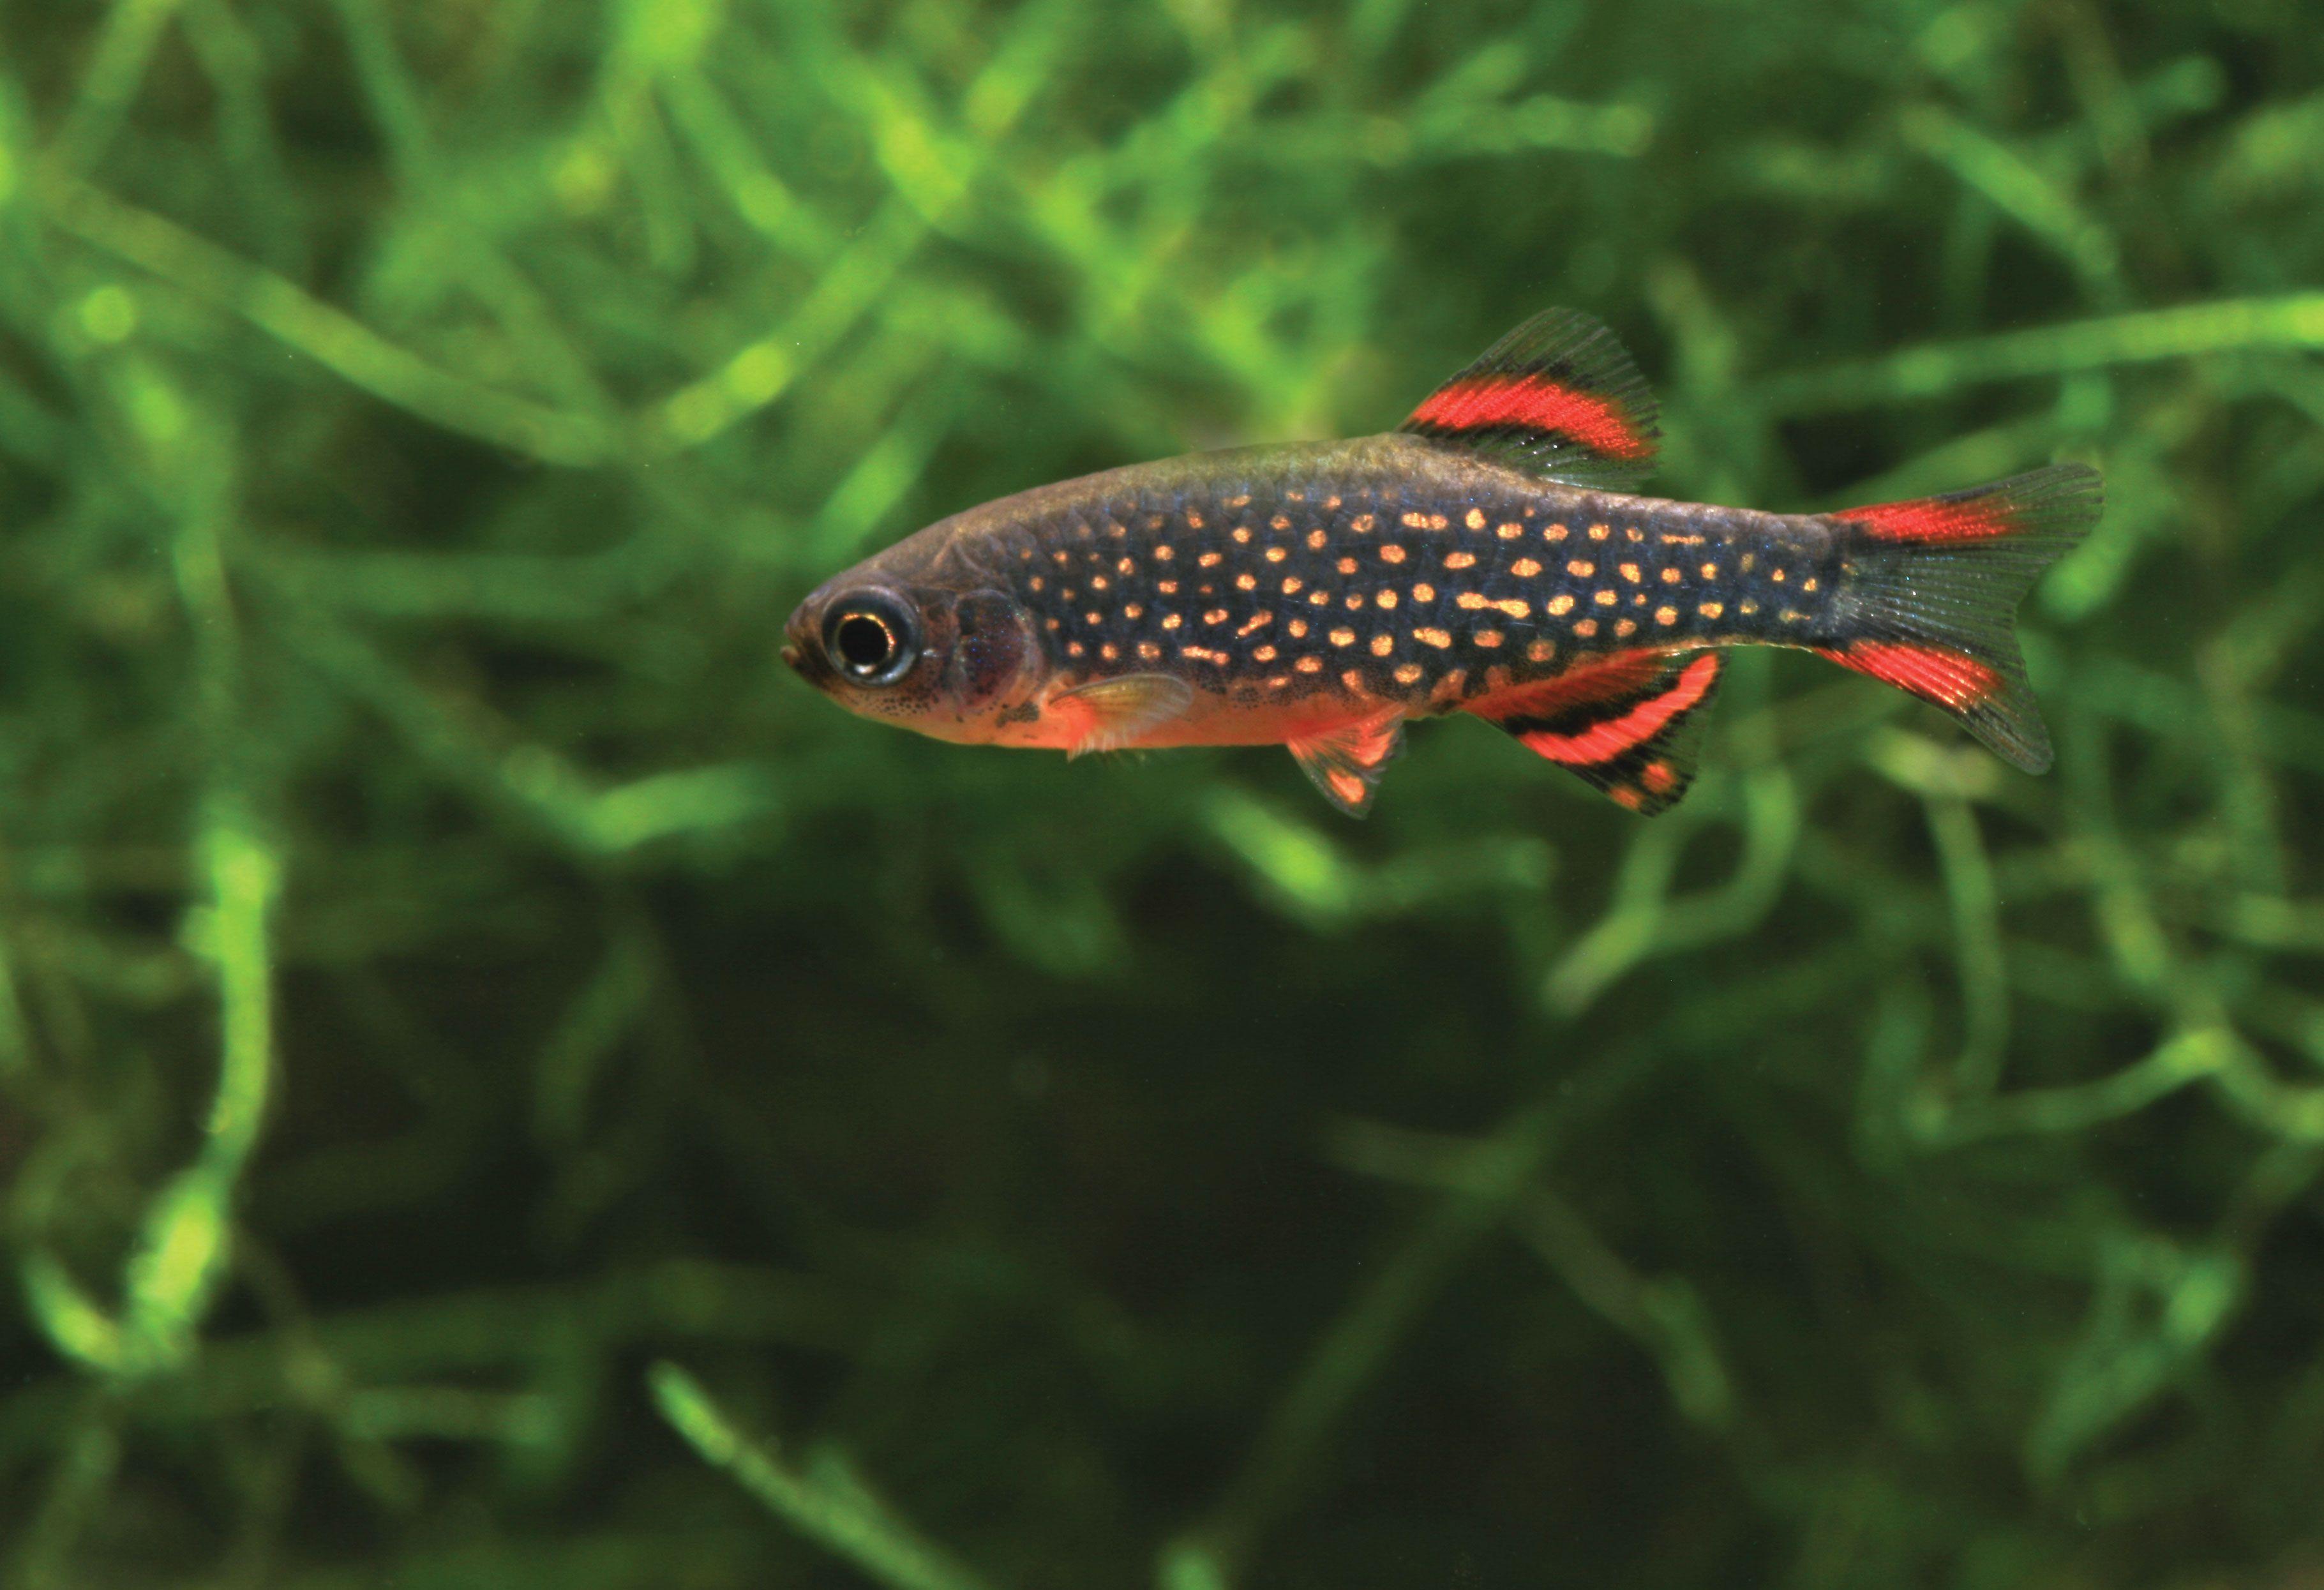 Pearl Danio | Popular Community Fish The Celestial Pearl Danio Is A Great Choice